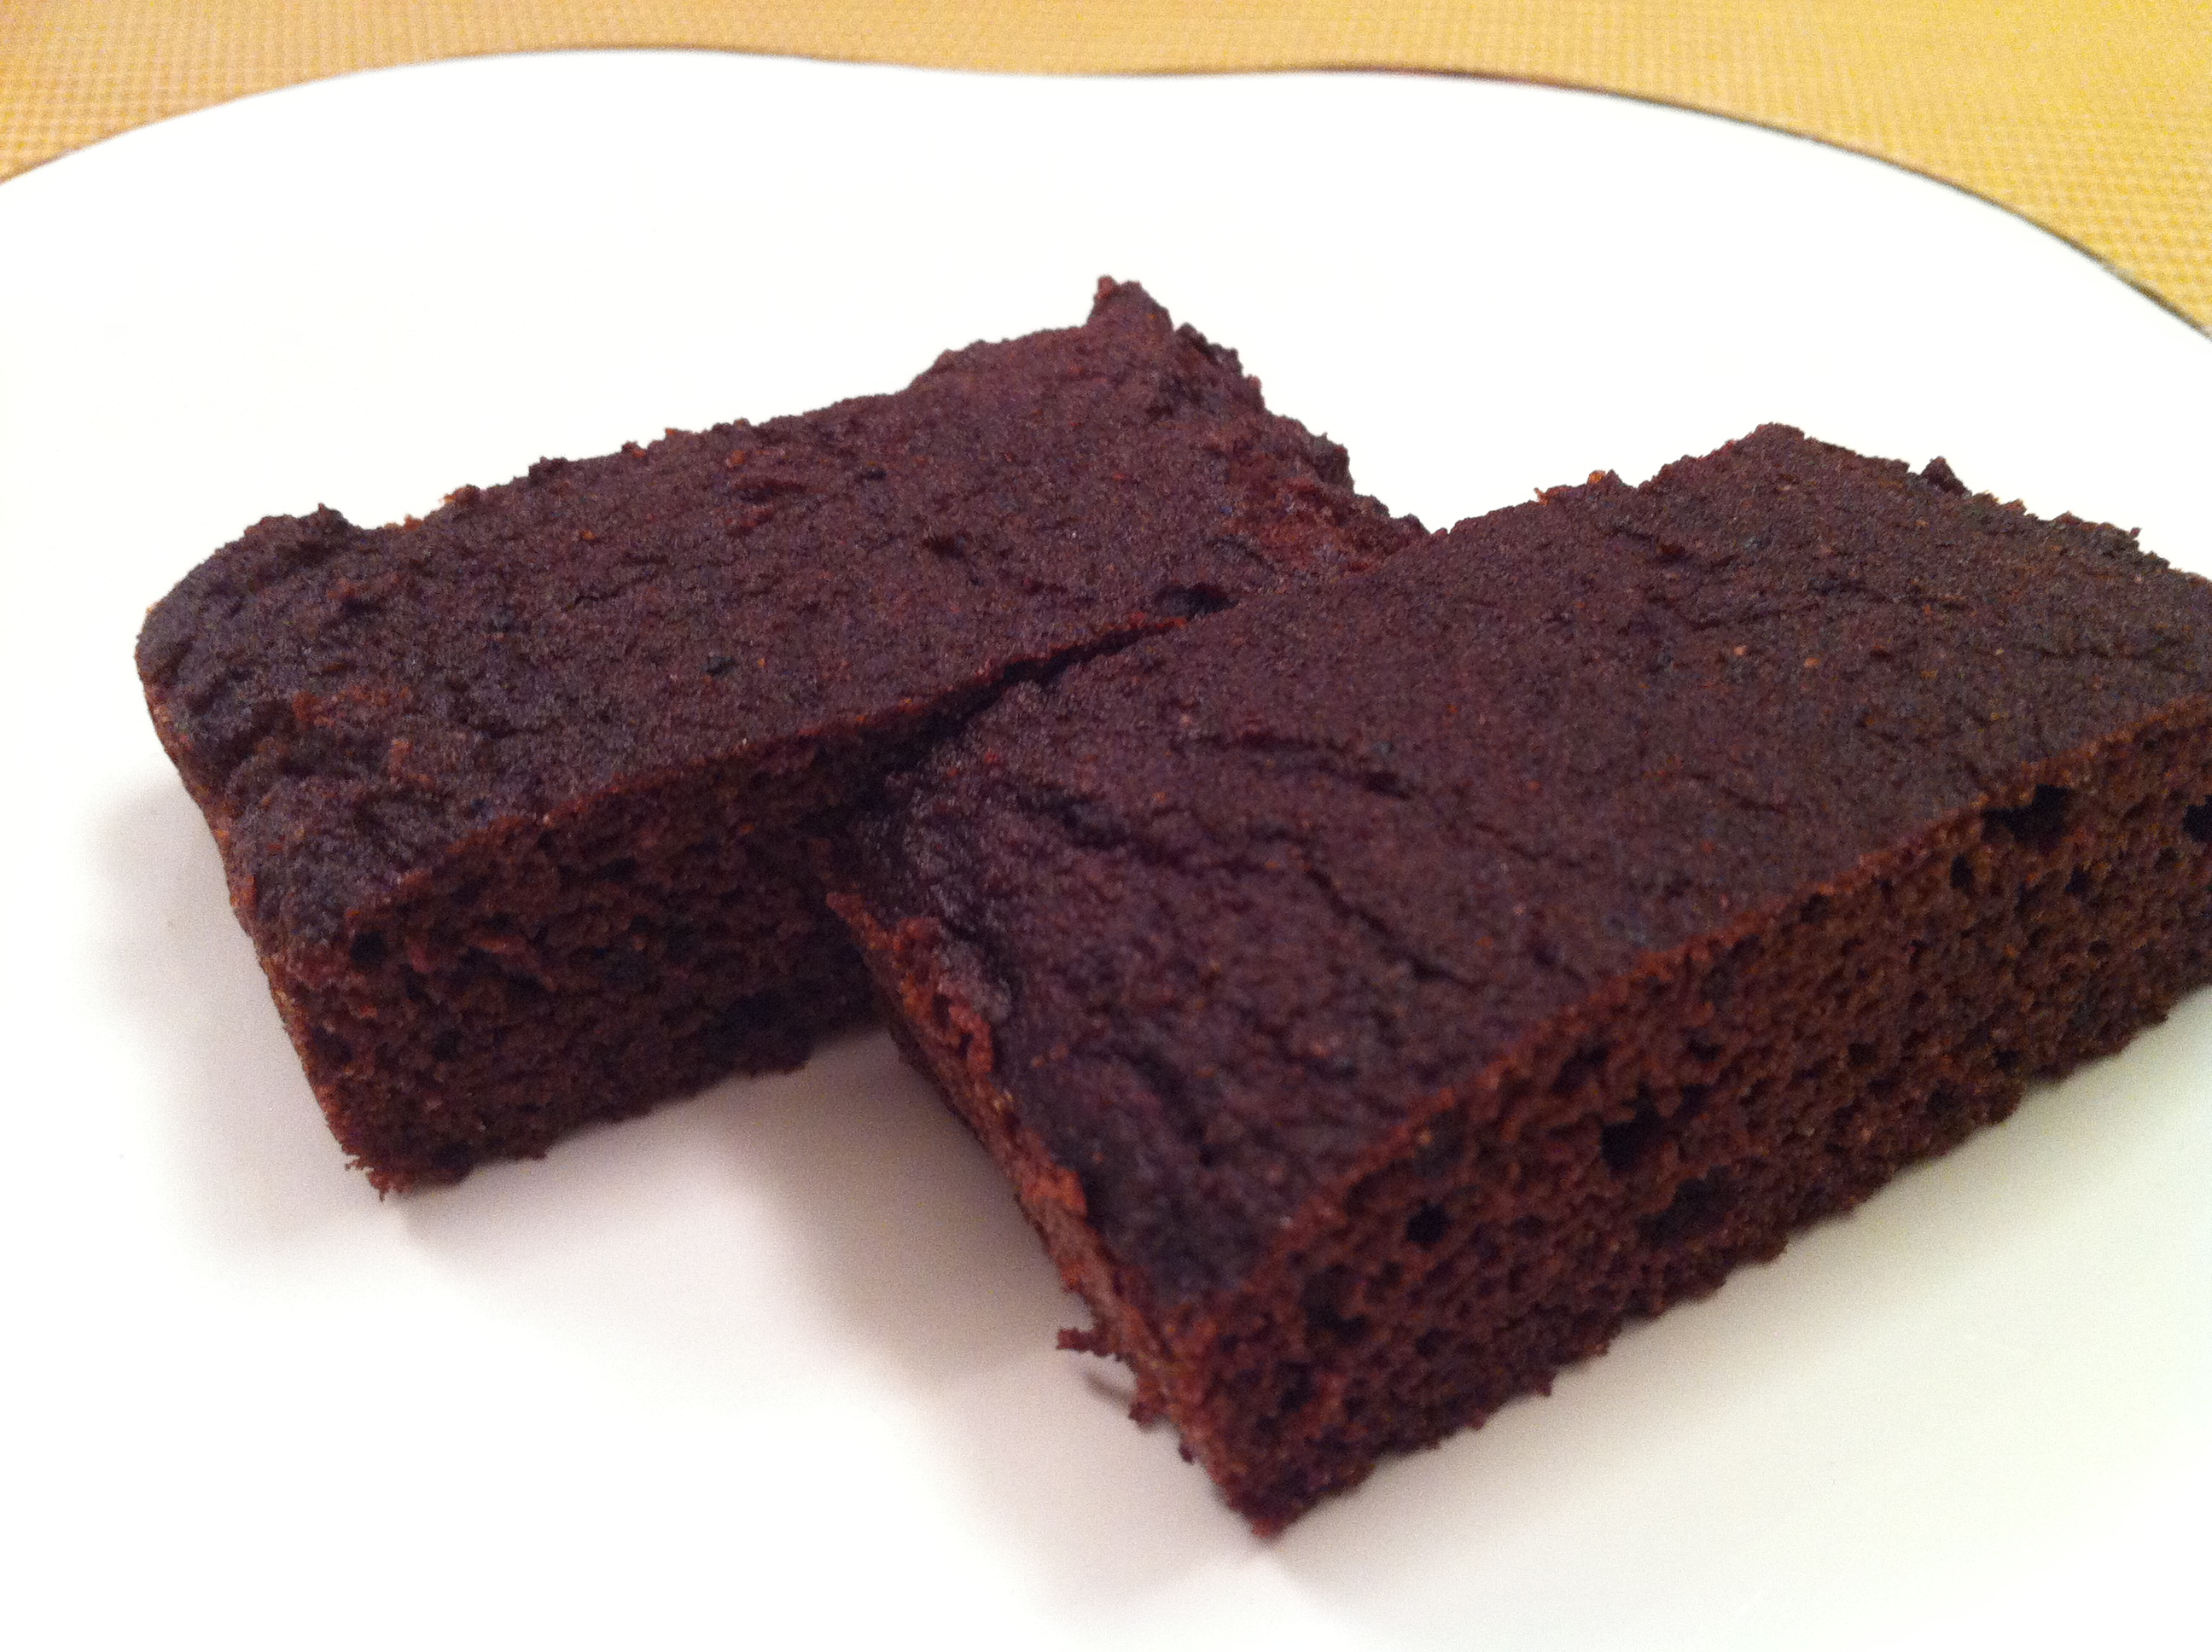 Basic Chocolate Cake With Coconut Flour